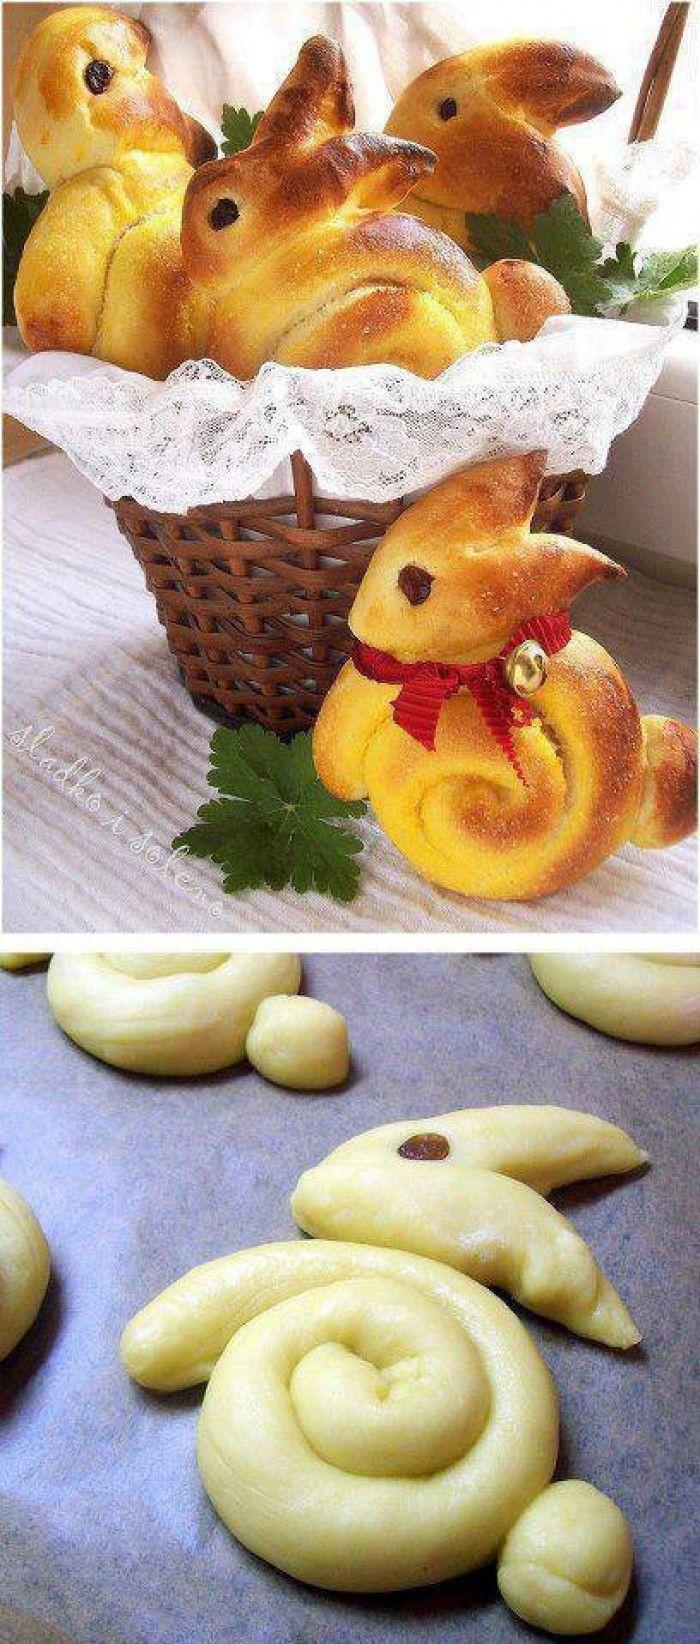 Lief konijn :...Ingrediënten: ... Bloem - 1 kg Melk - 150ml olie - 200ml water - 300ml gist - 70 g zout - 30g suiker -40g abrikozenjam - 200 g rozijnen - 100g